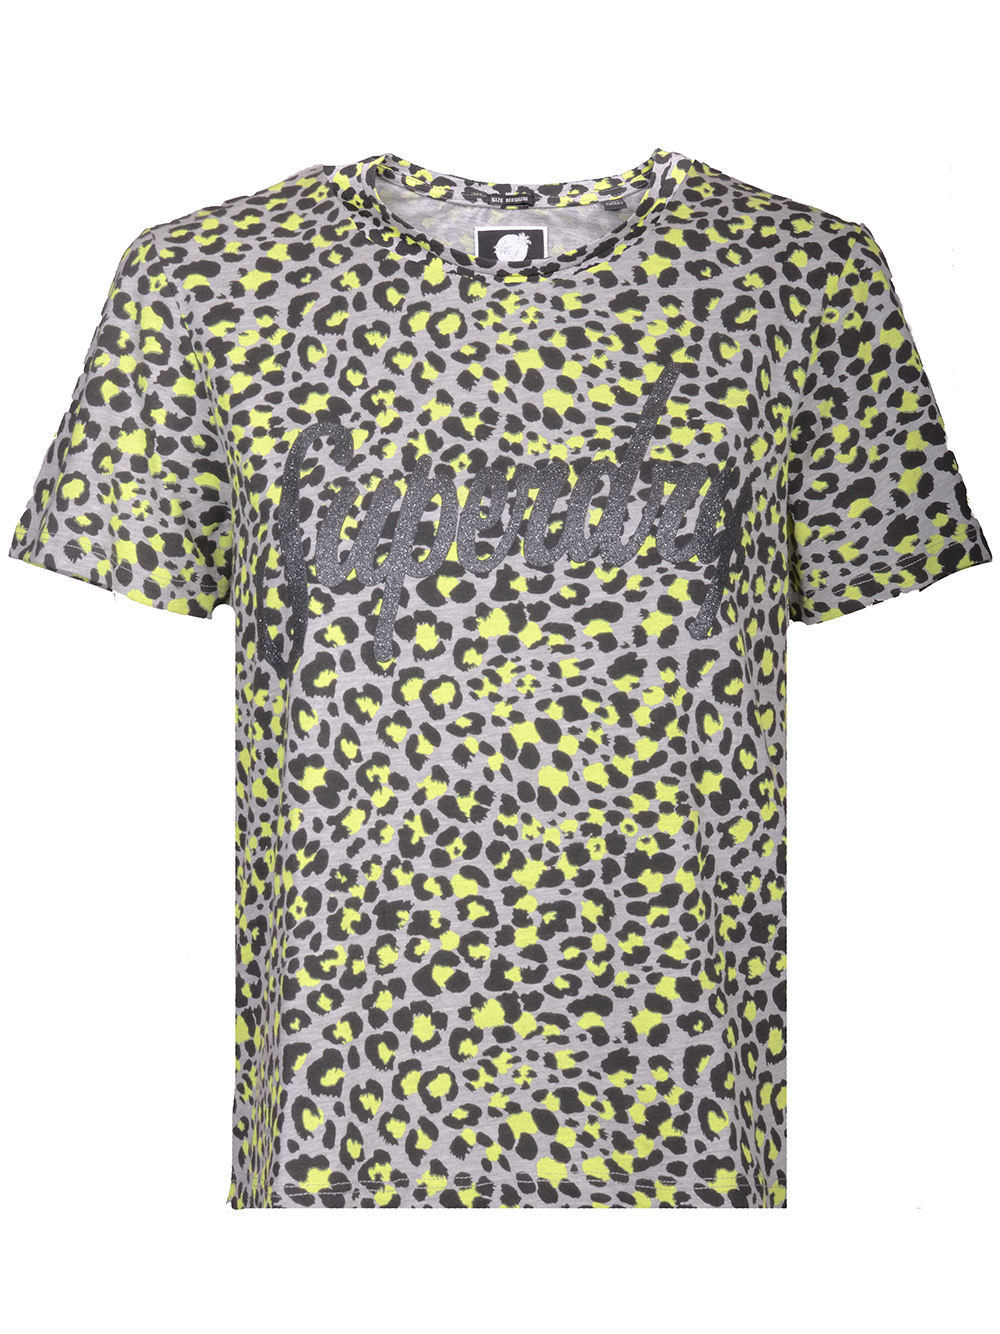 SUPERDRY Μπλούζα T-shirt κοντό μανίκι G60005XQ ΓΚΡΙ